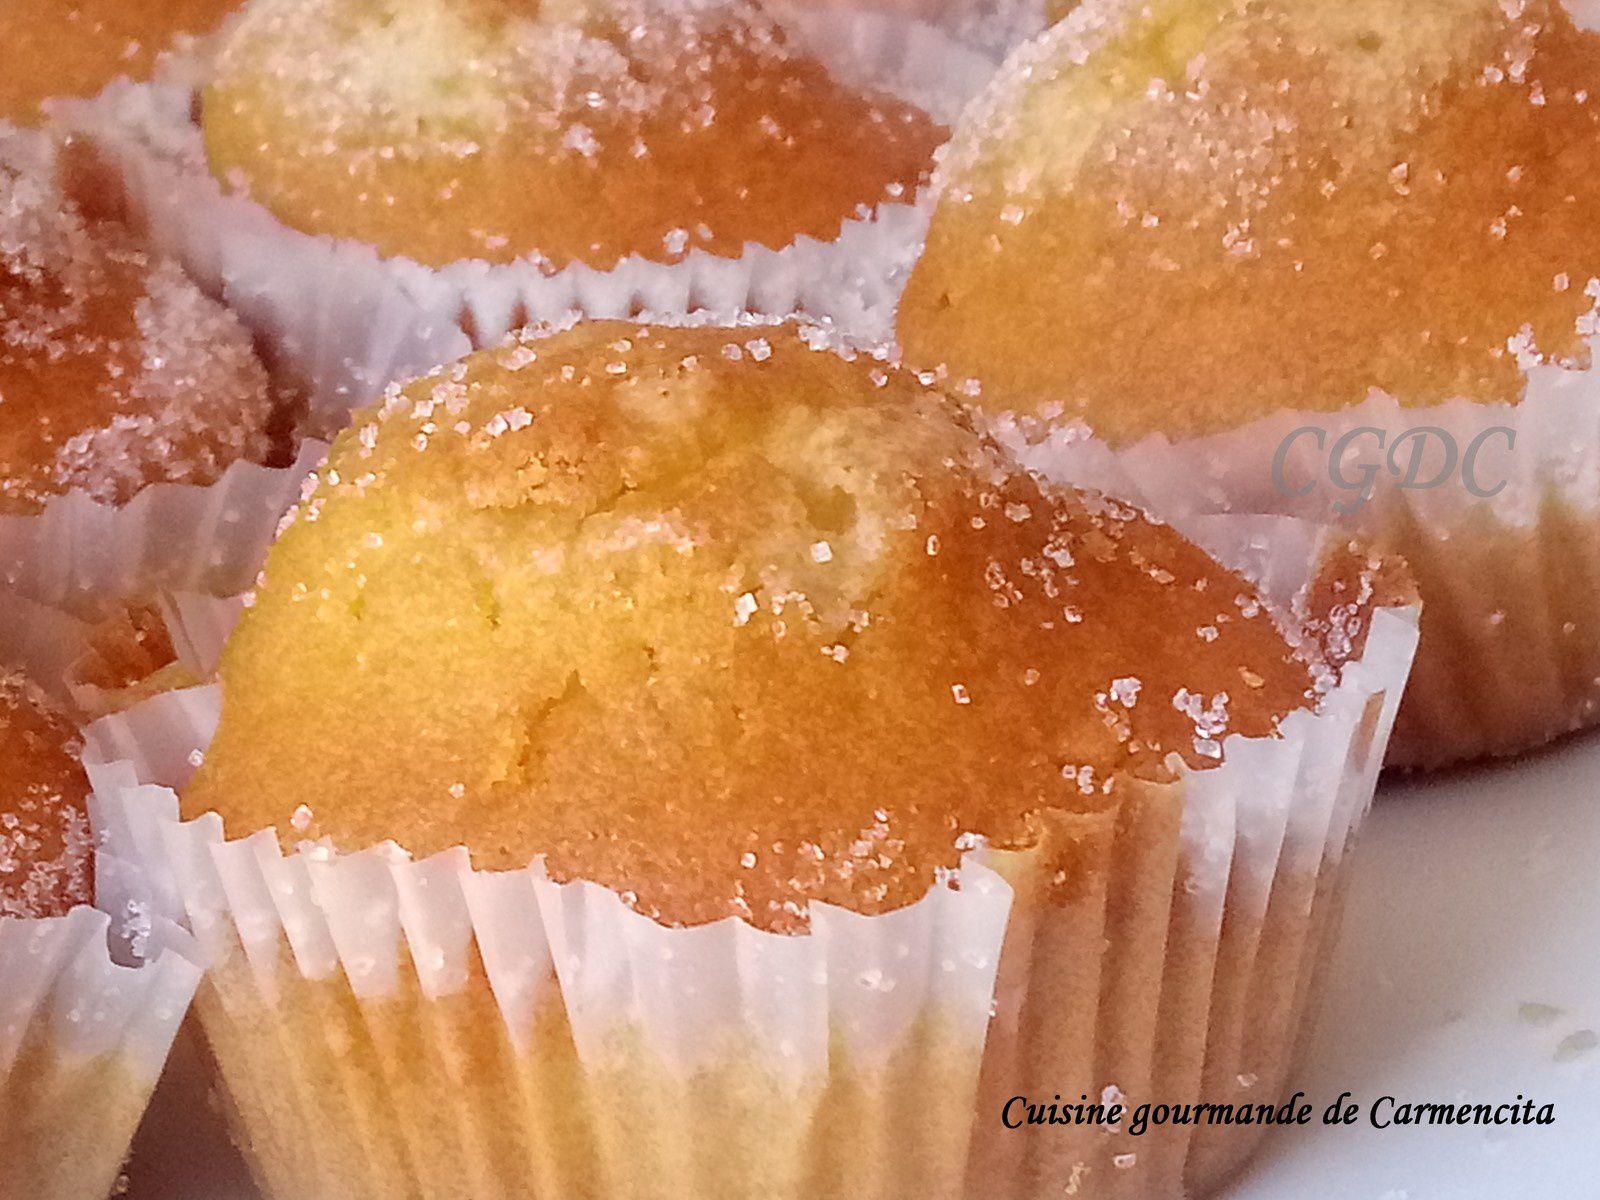 Magdalena ou Madeleine espagnole au citron et vanille - Cuisine gourmande de Carmencita